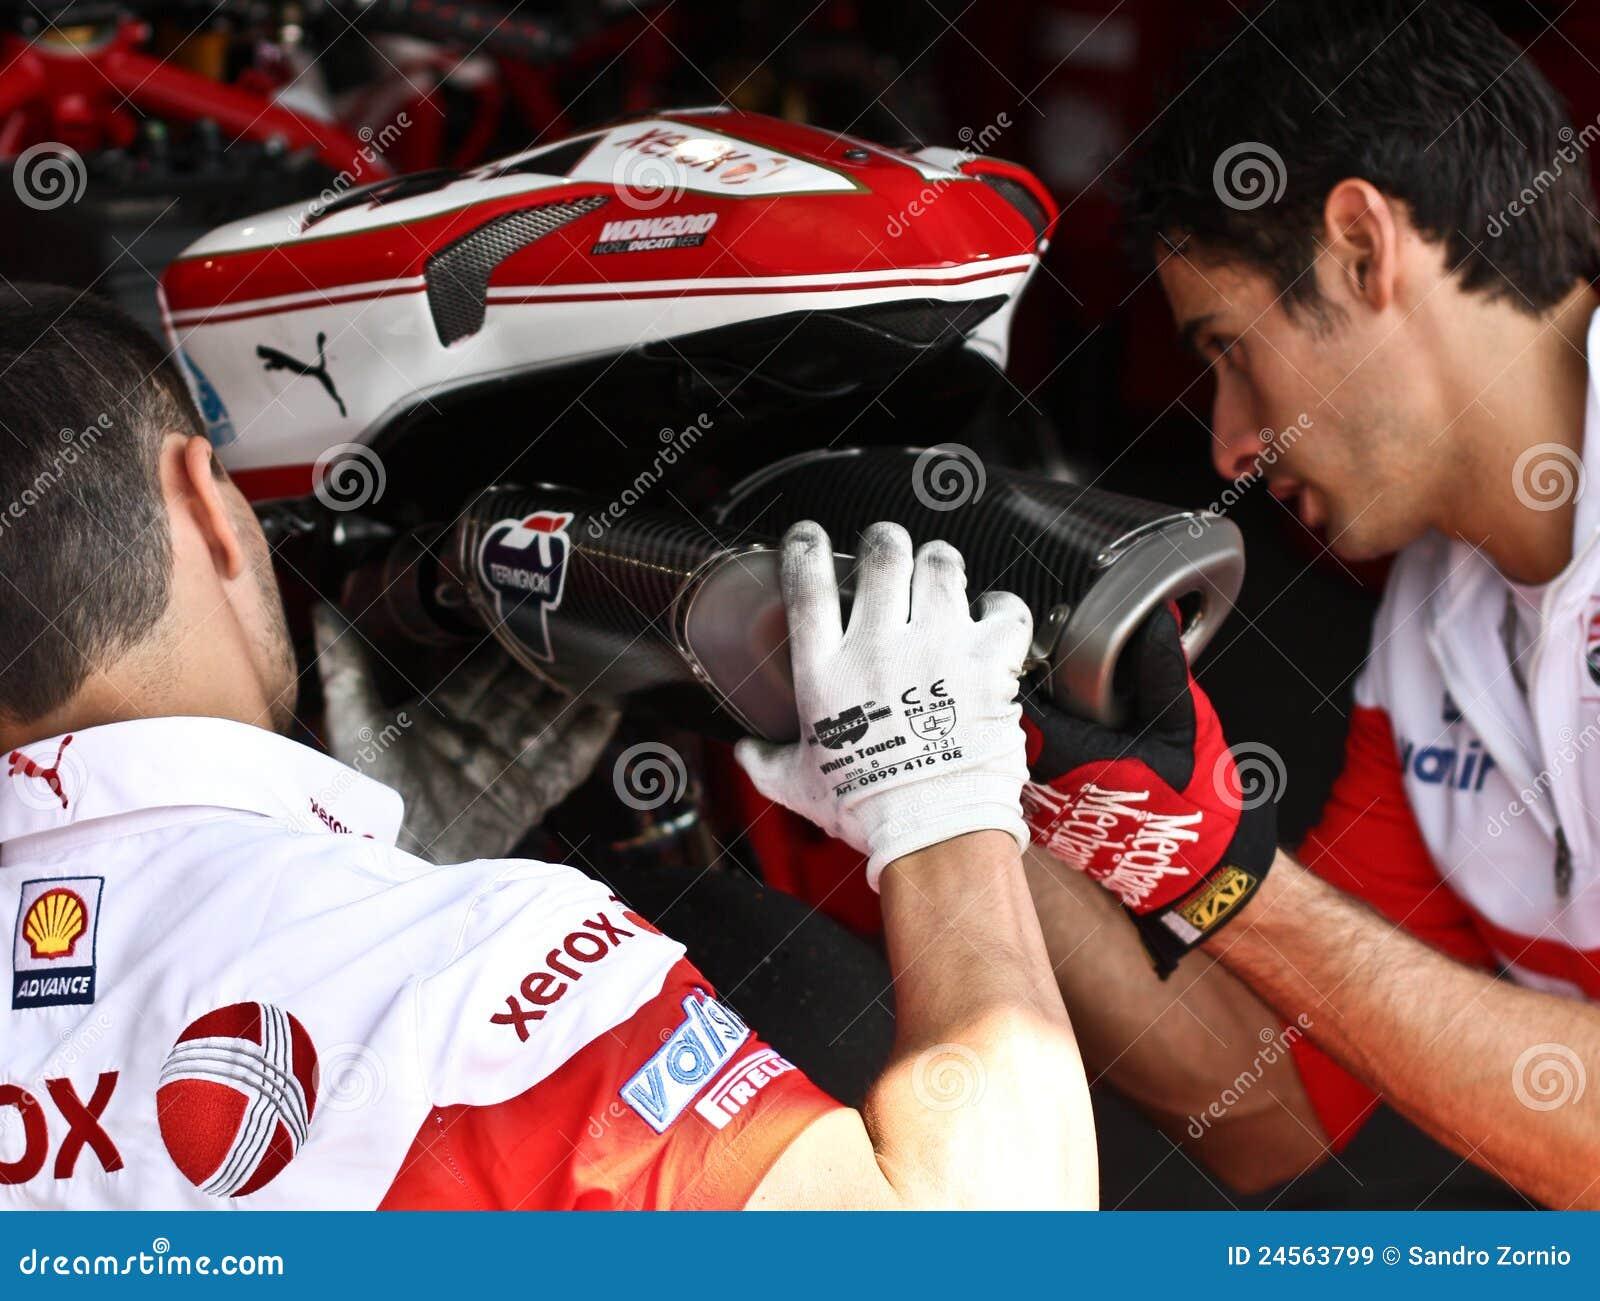 Two mechanics change the exhaust pipe